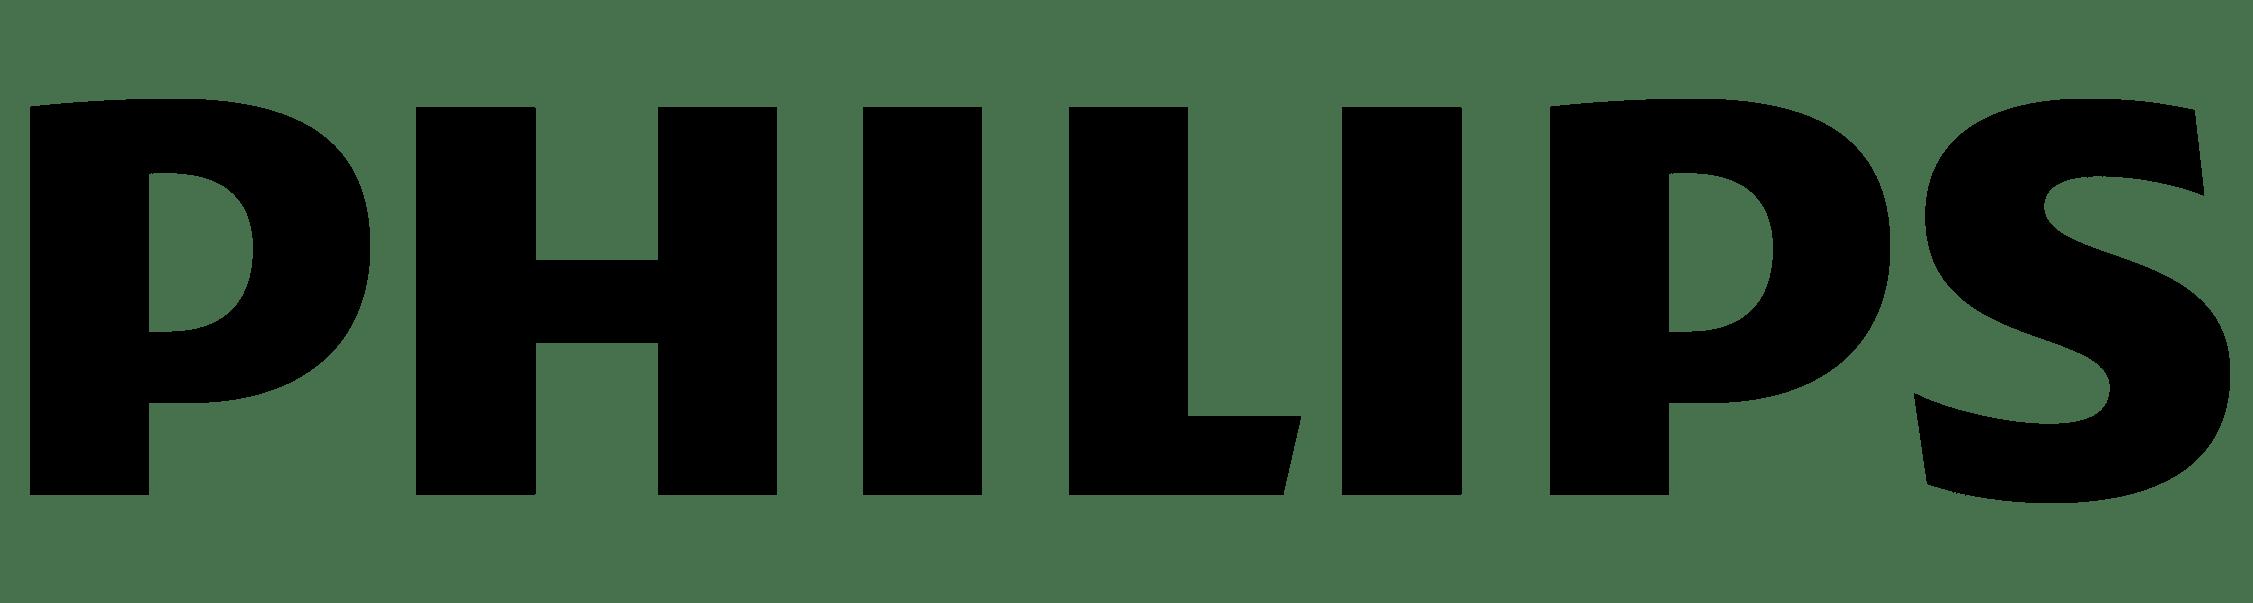 philips-logo-black-and-white-1